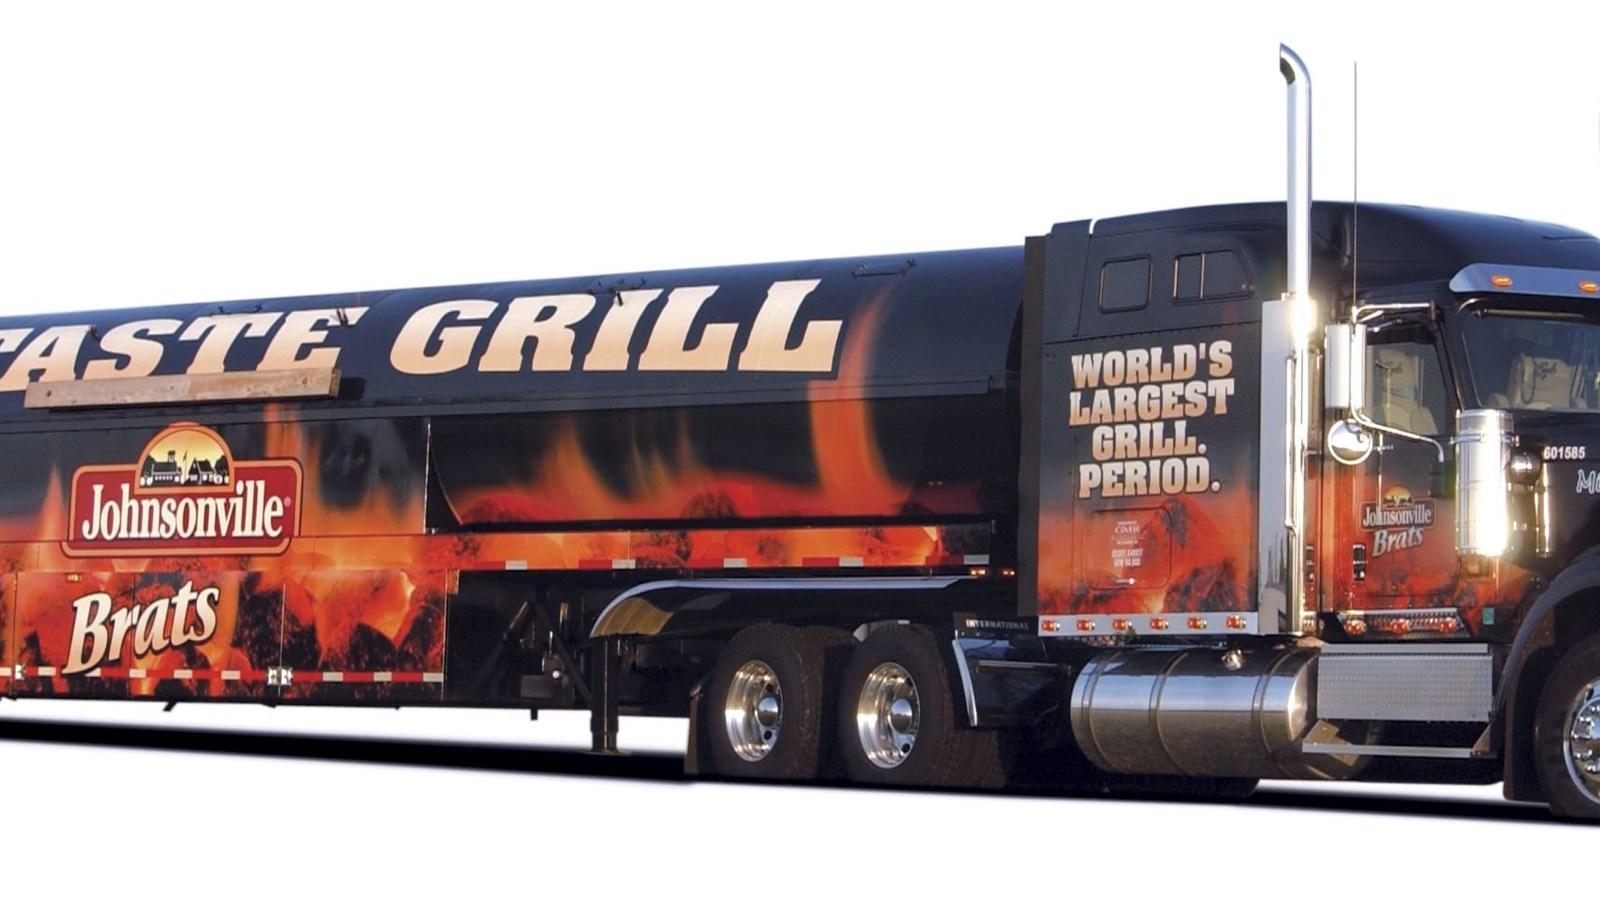 Freightliner semi trucks 18 wheeler road wallpapers - 18 wheeler wallpaper ...